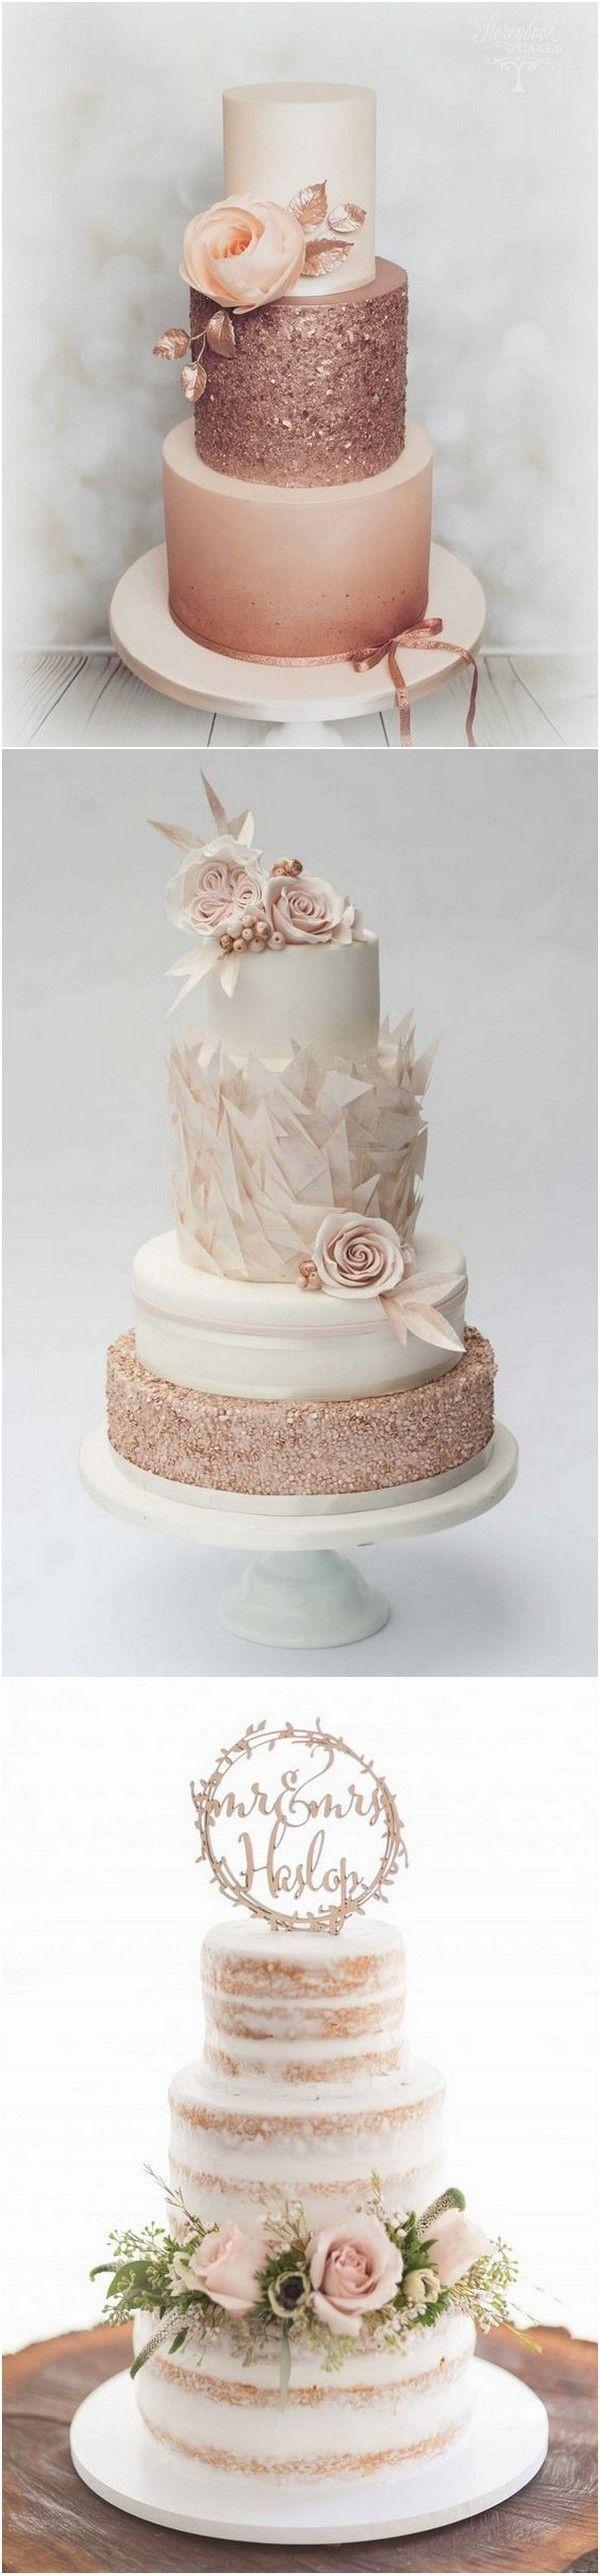 40 Romantic Blush Pink Wedding Ideas for Spring/Summer